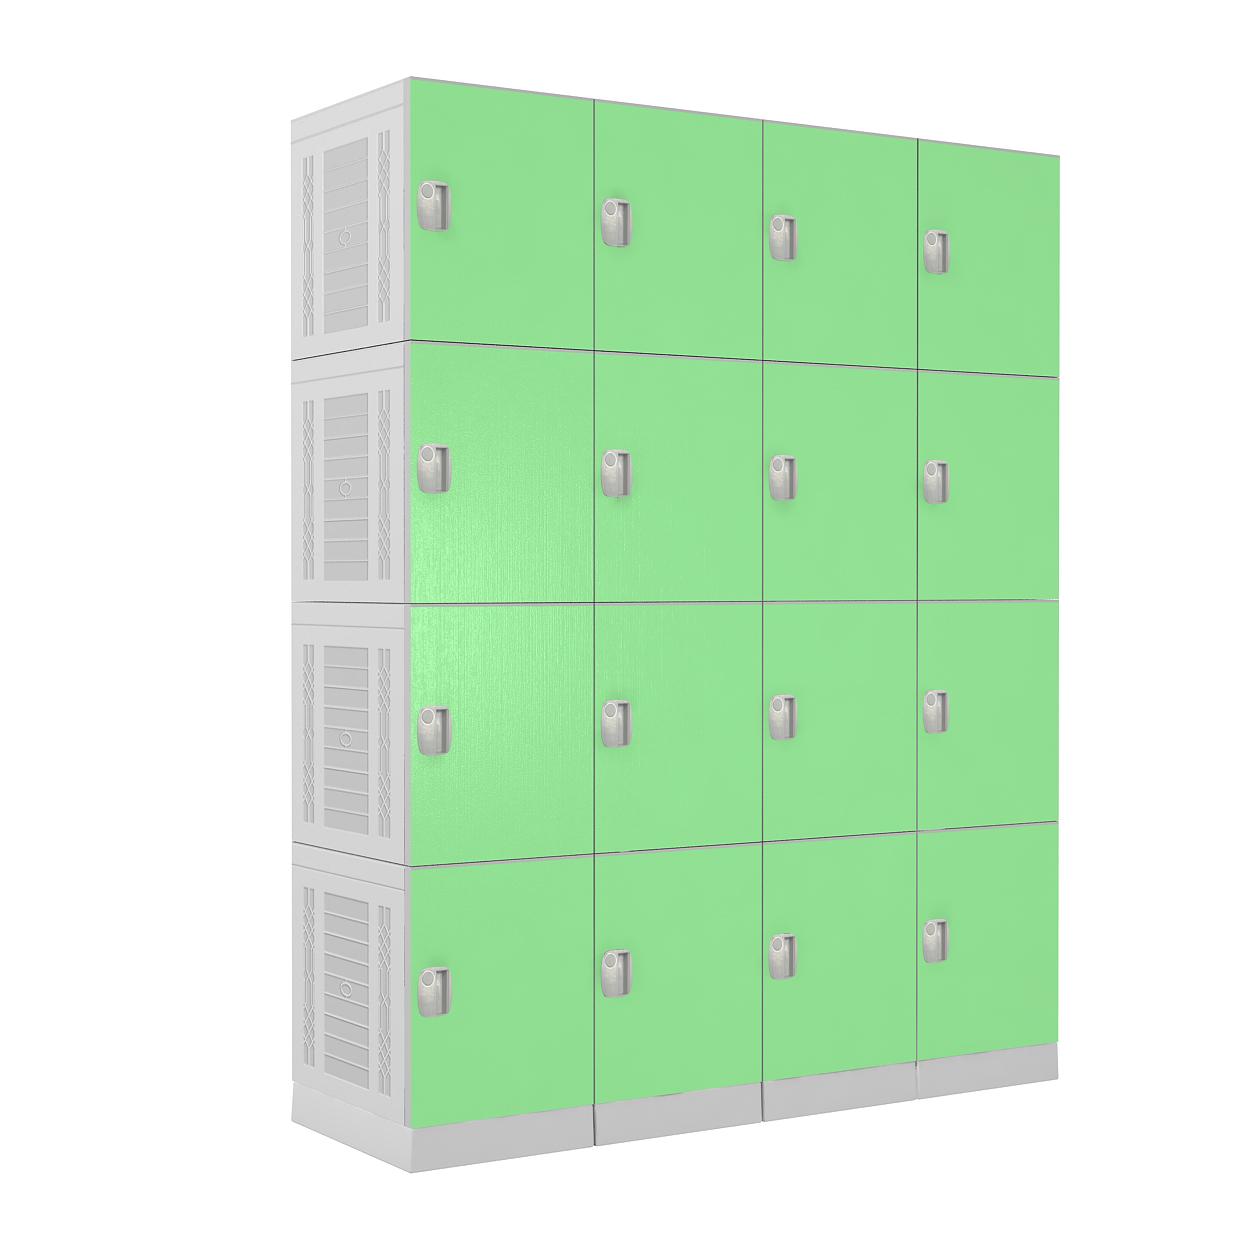 China plastic lockers / school  lockers / gym lockers / plastic spa locker  EL450-03